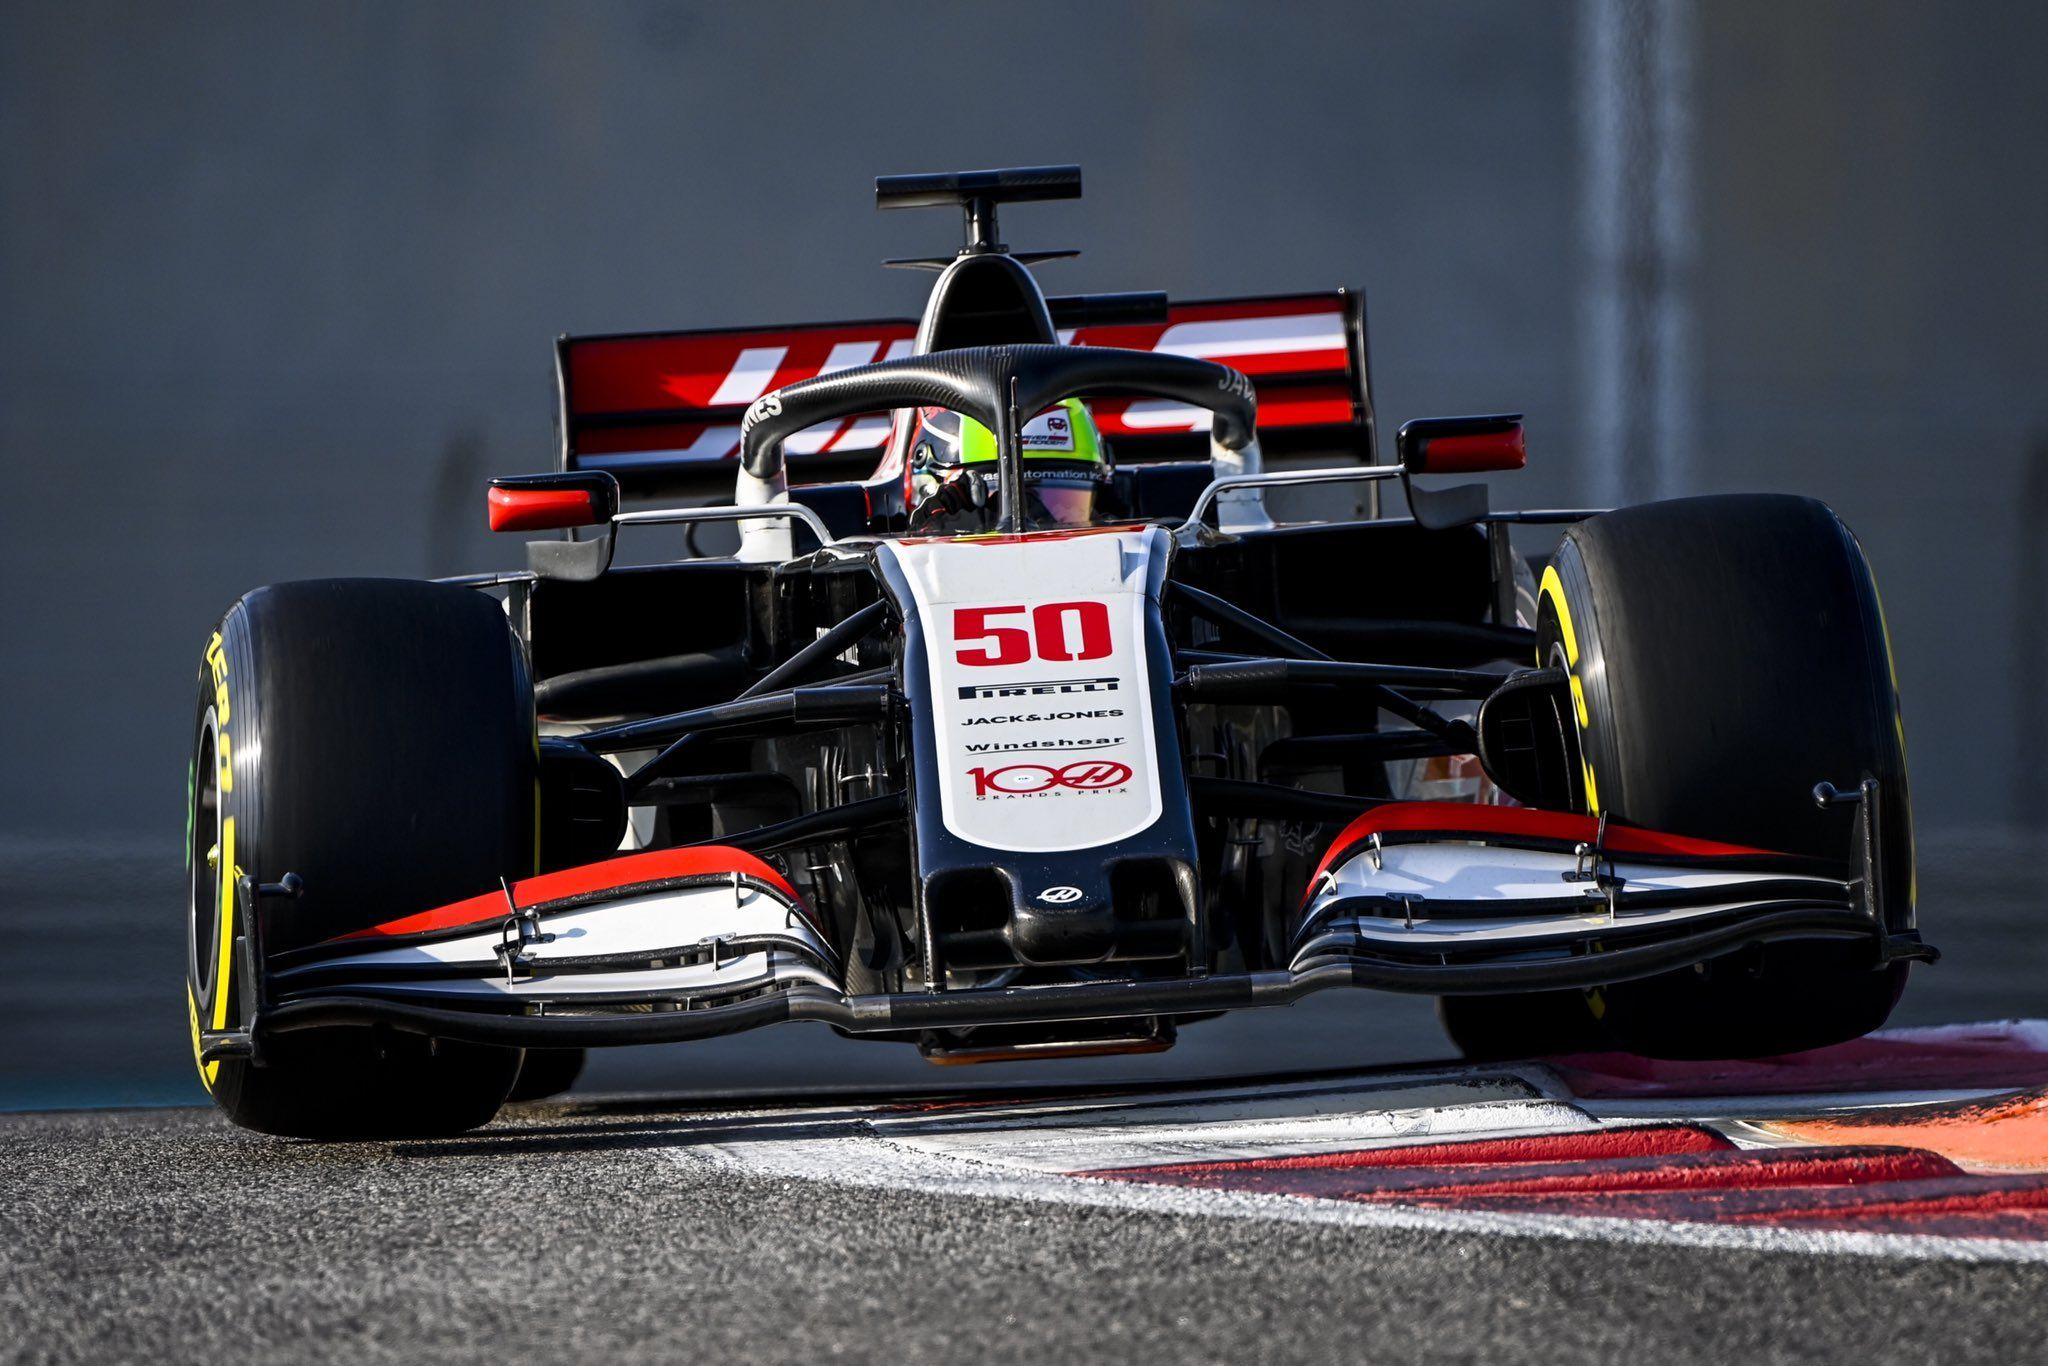 F1, Abu Dhabi, Mick Schumacher